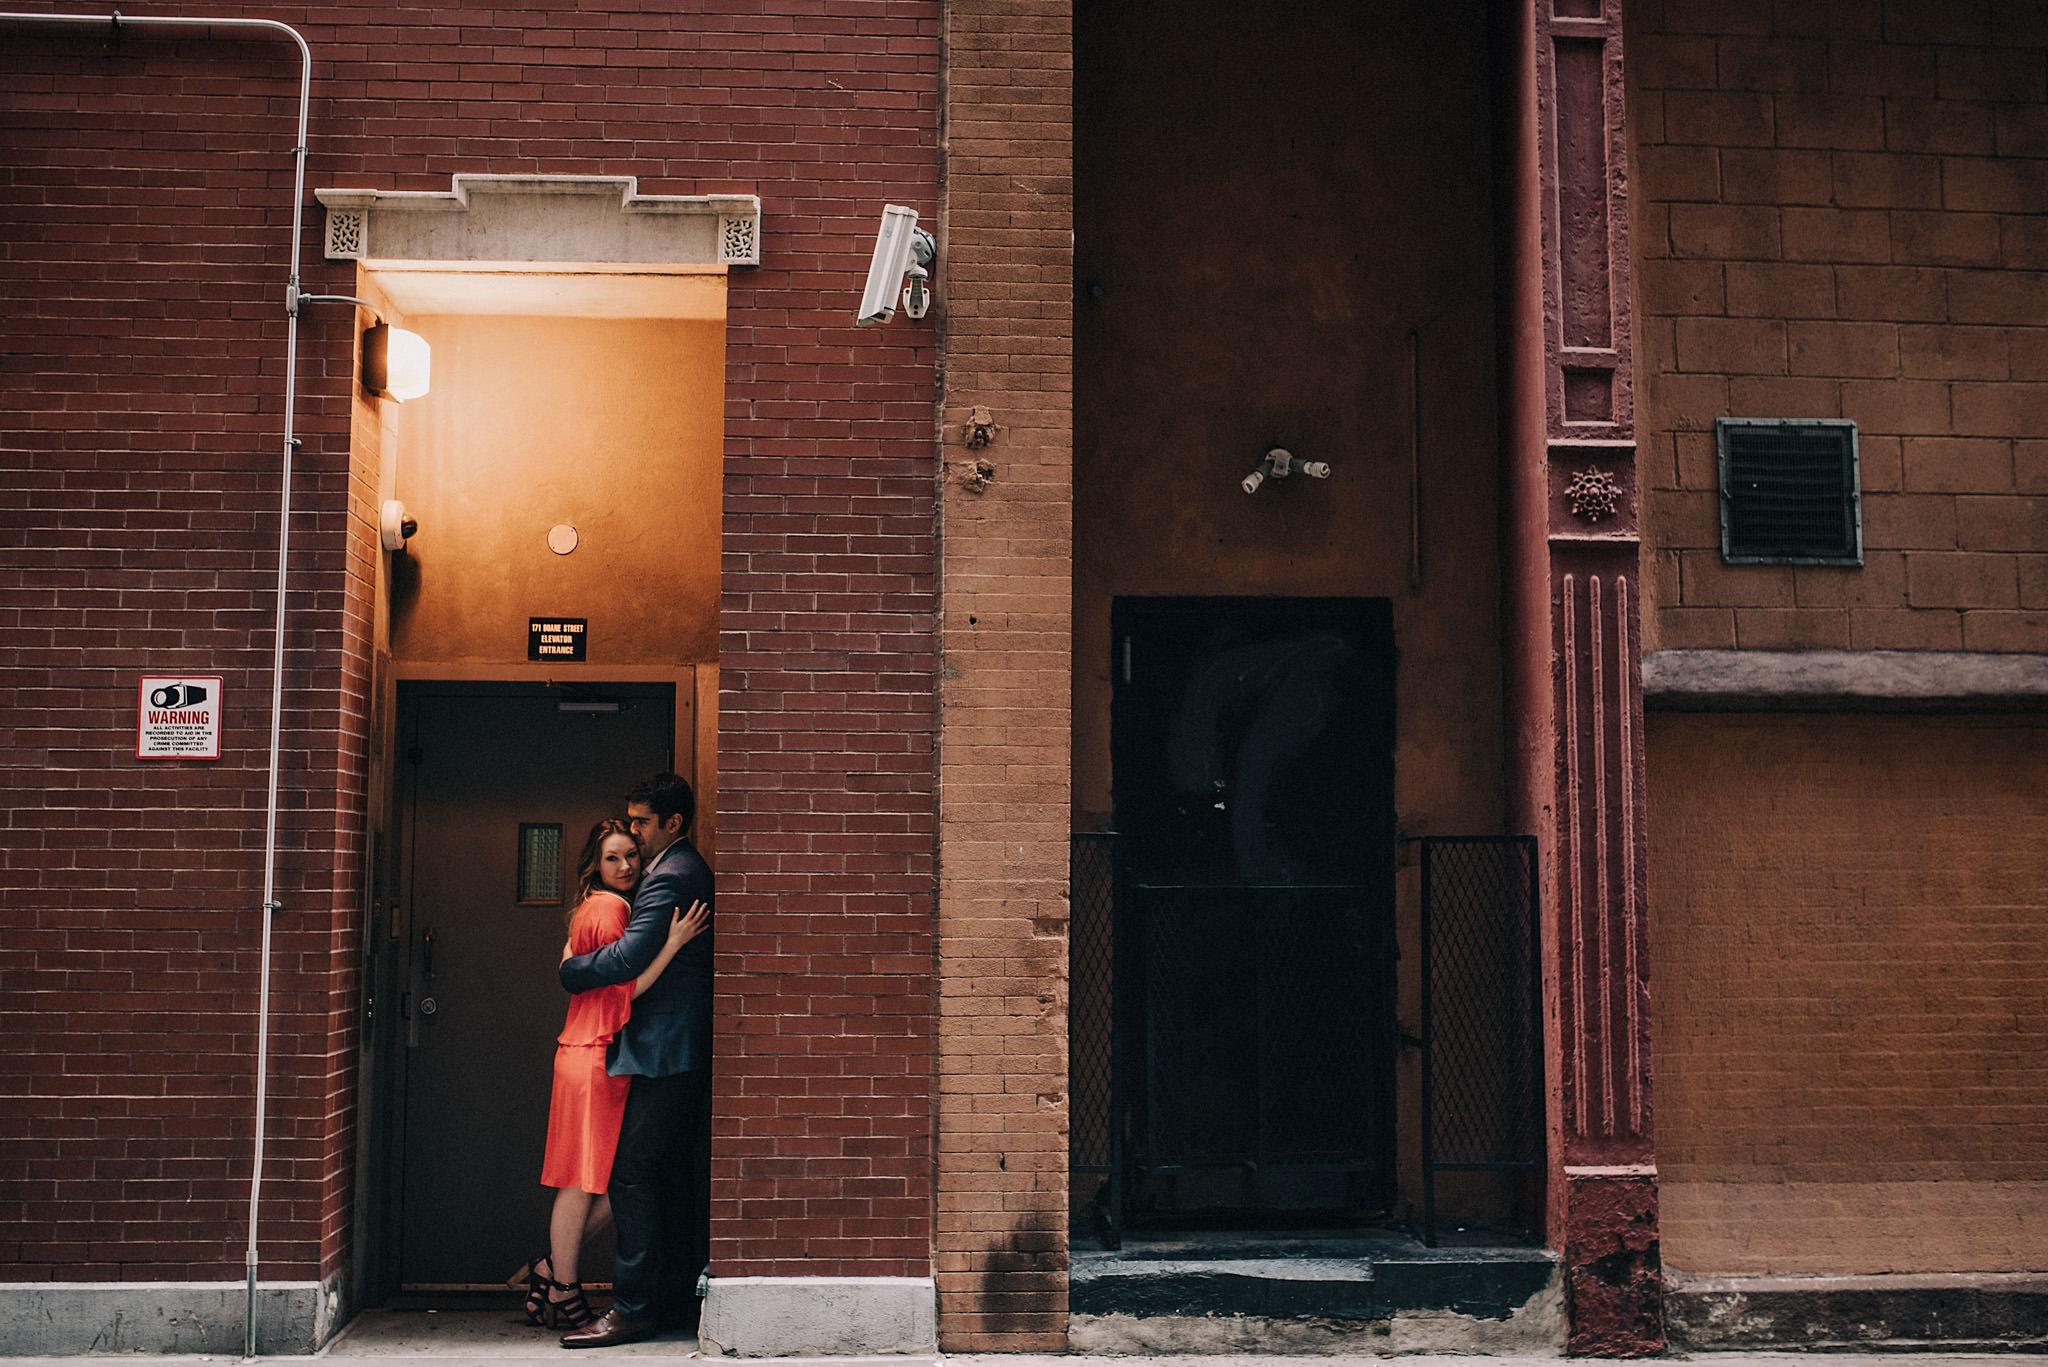 New-York-Wedding-Photoshoot-Felipe-Carranza-12